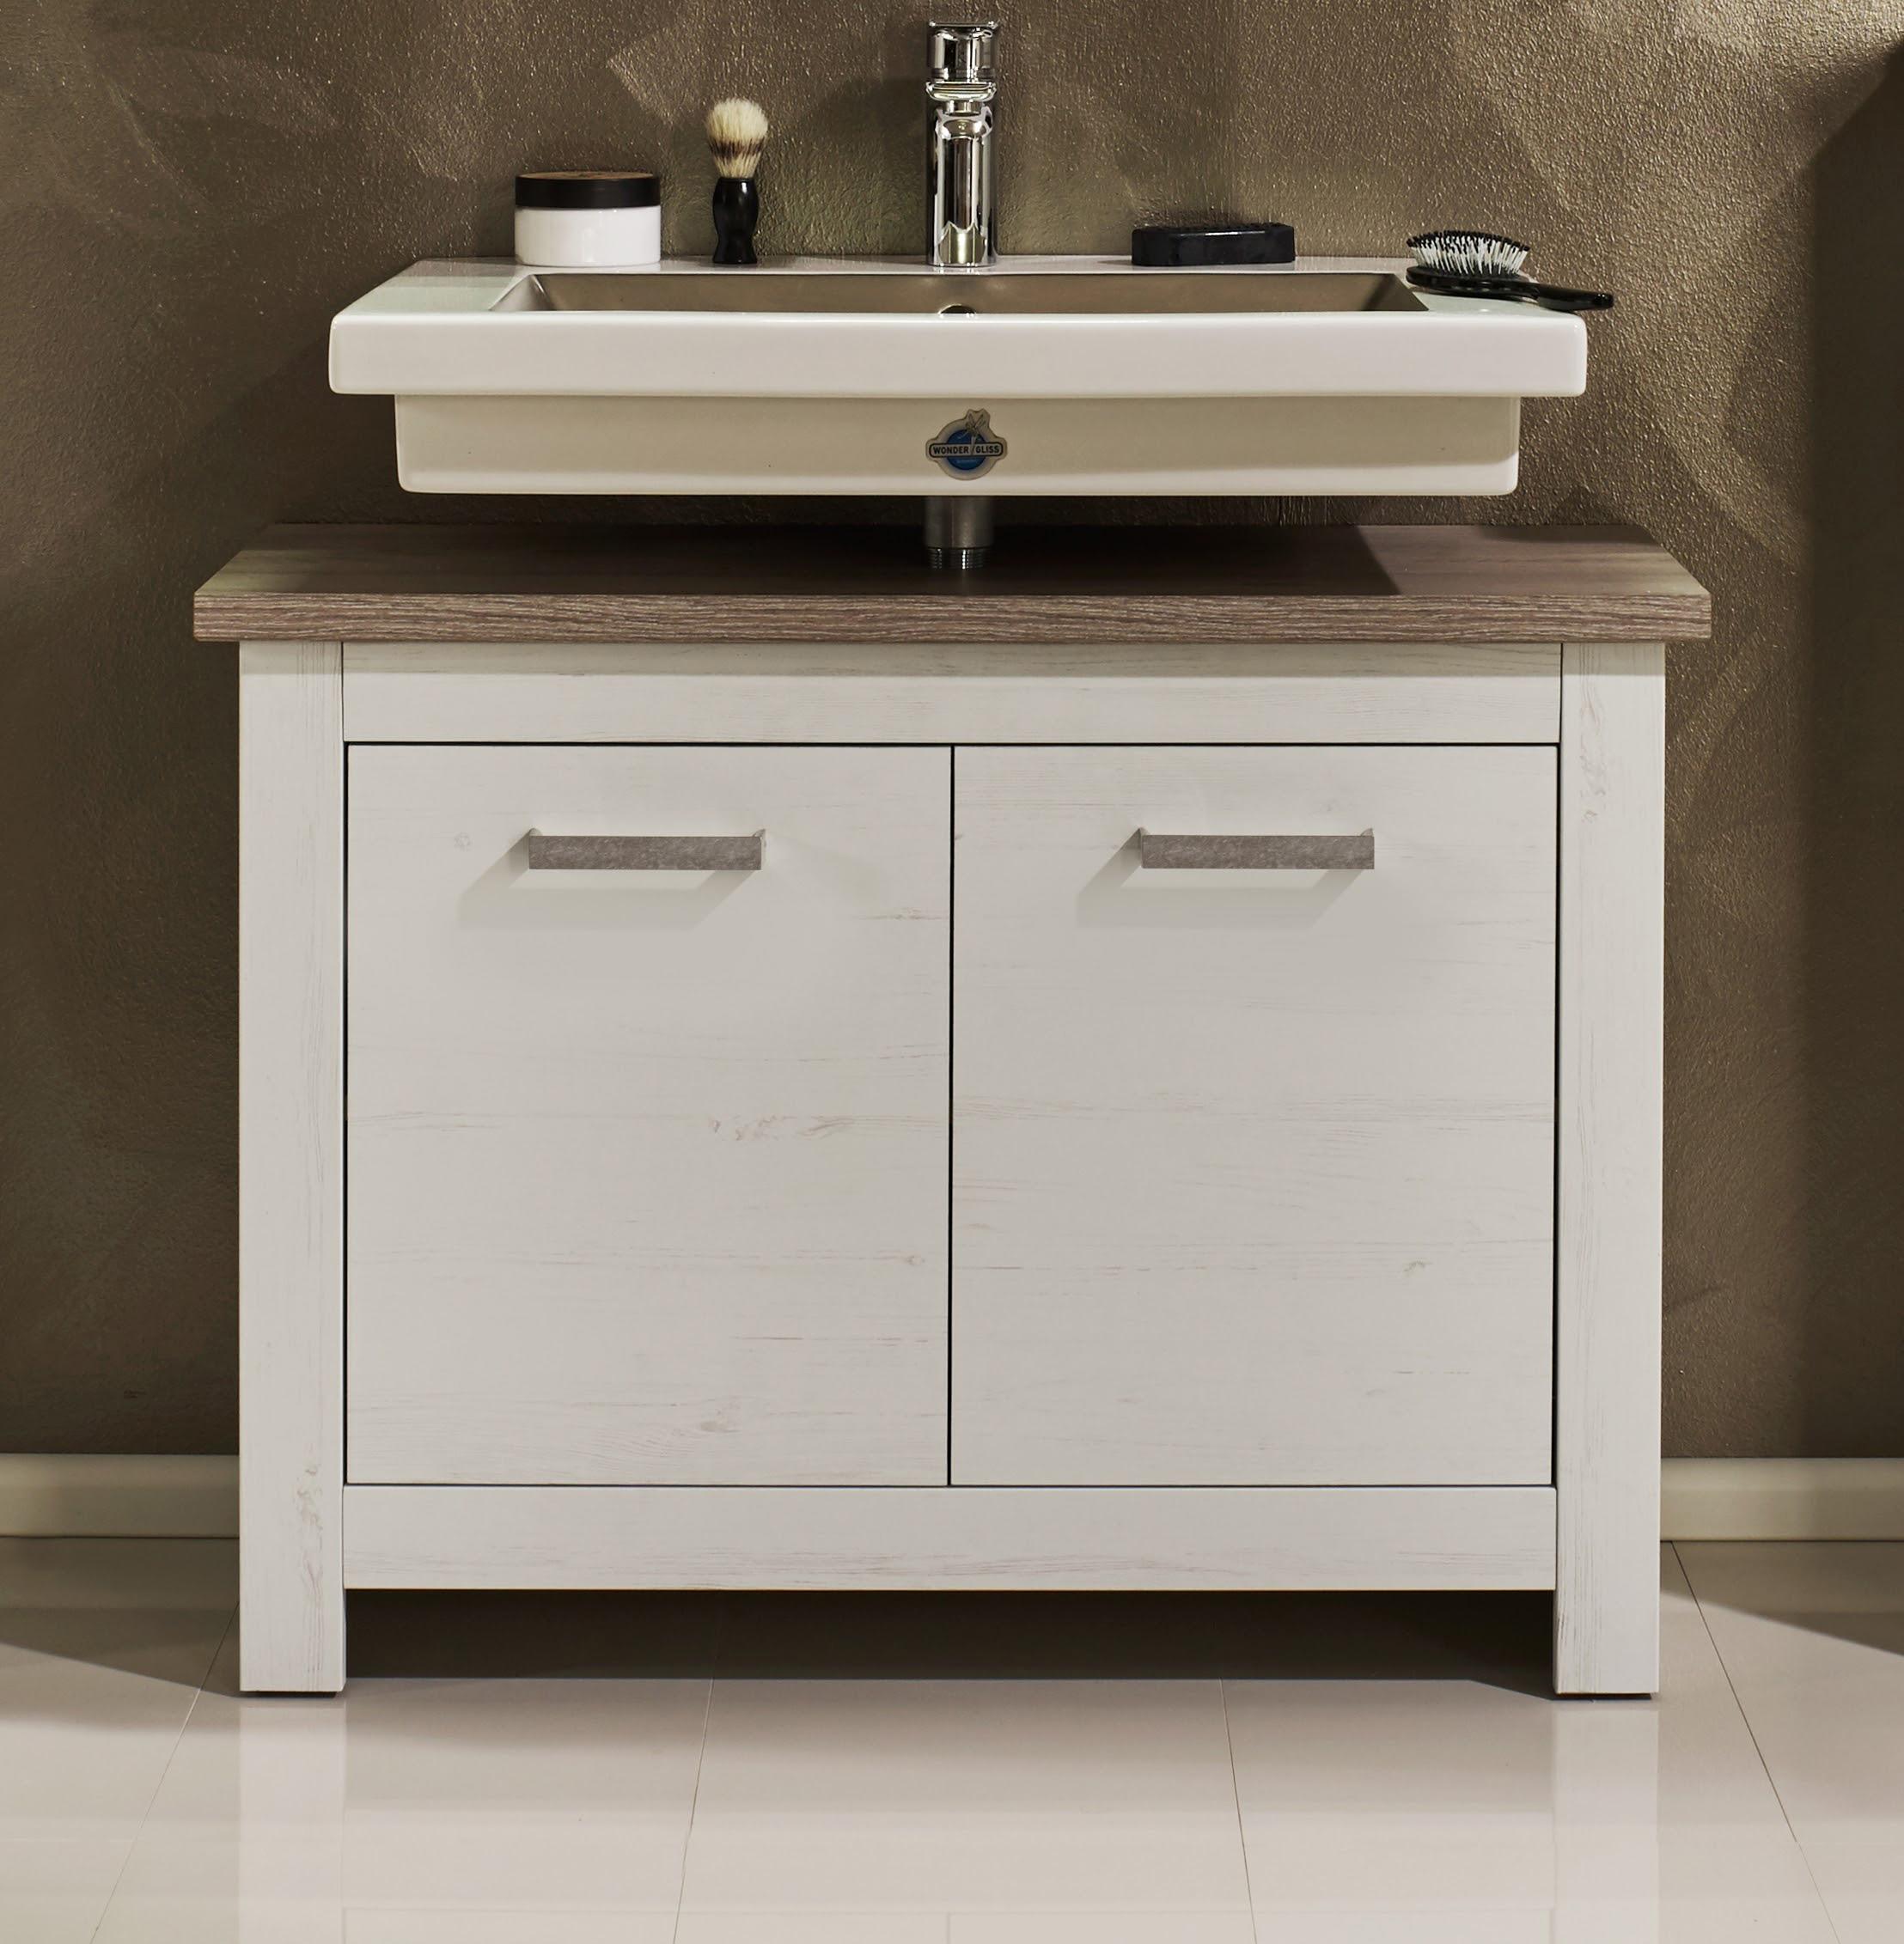 meuble sous lavabo contemporain ch ne blanchi glamour. Black Bedroom Furniture Sets. Home Design Ideas